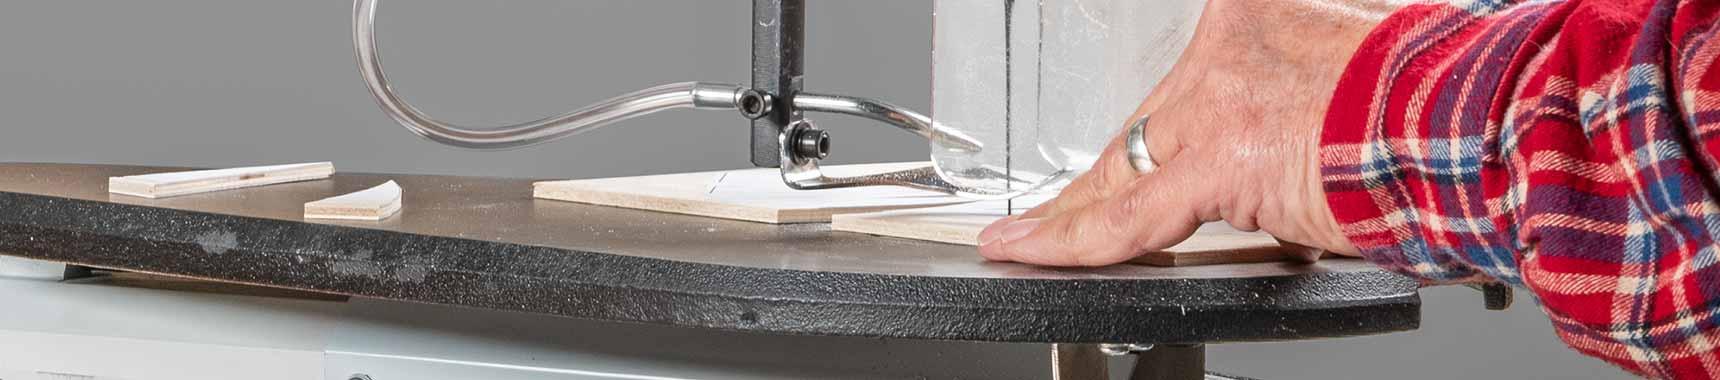 Axminster Craft AC456SS 456mm Scroll Saw